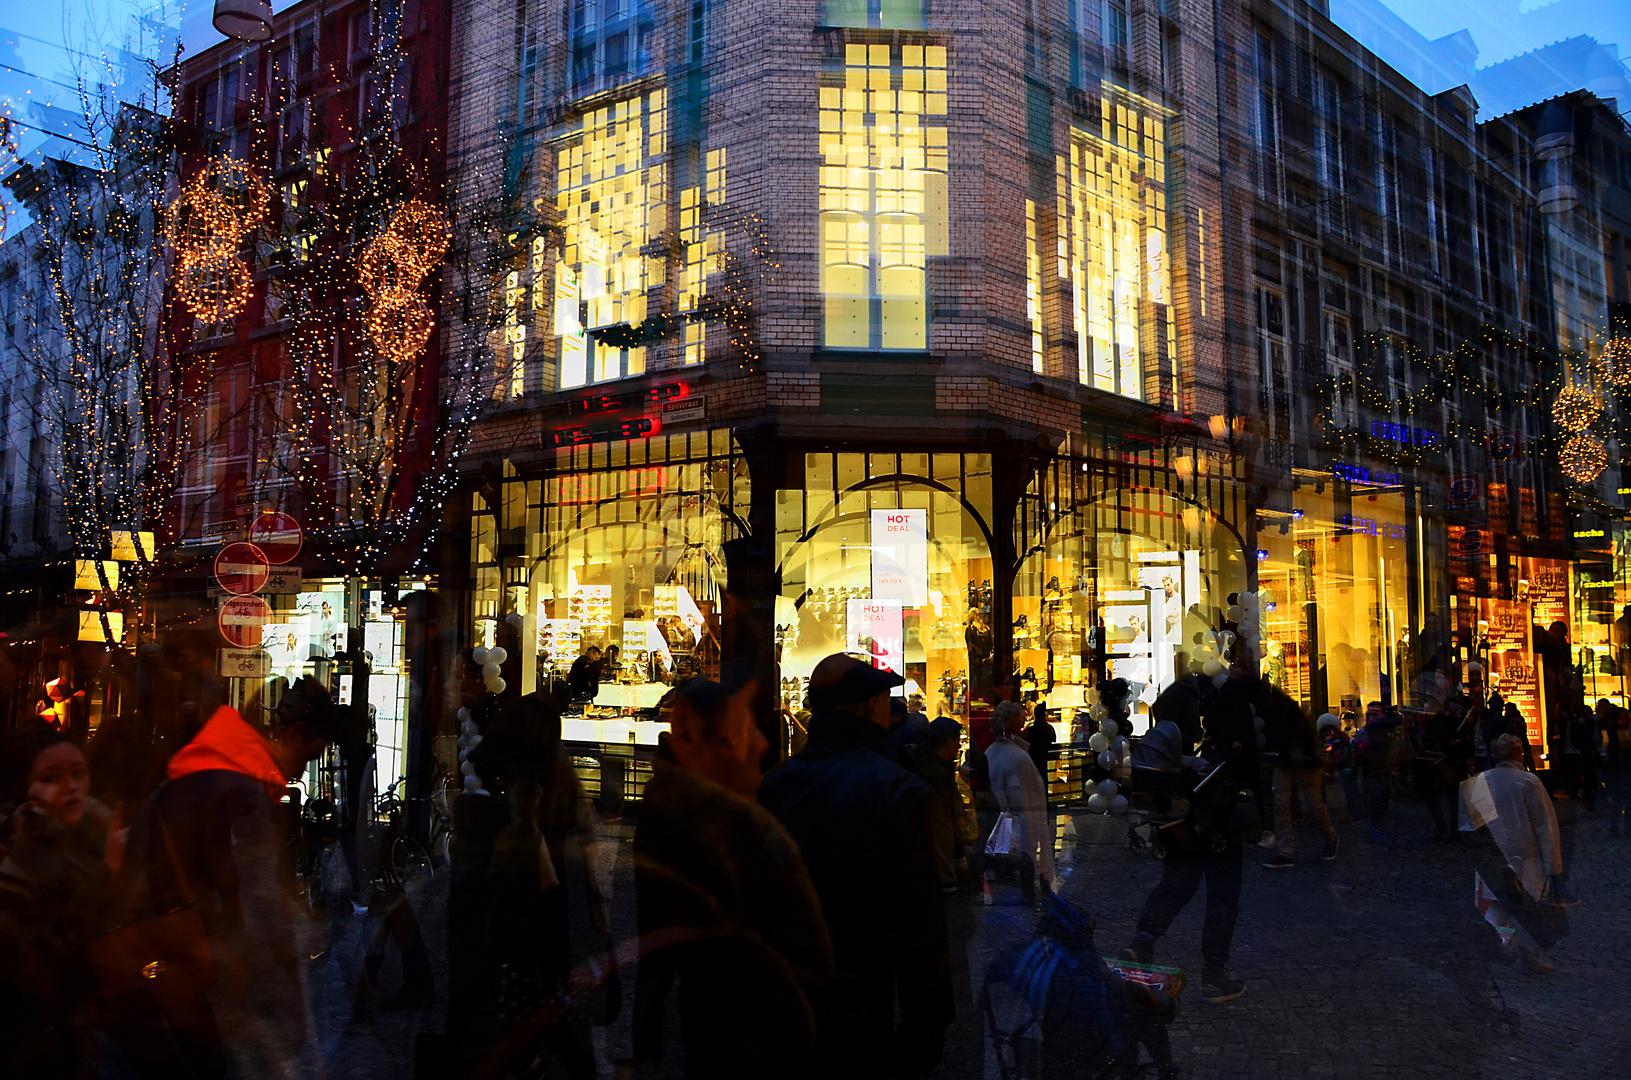 Christmas Shopping in Maastricht # 7134 Foto & Bild | nikon, street ...